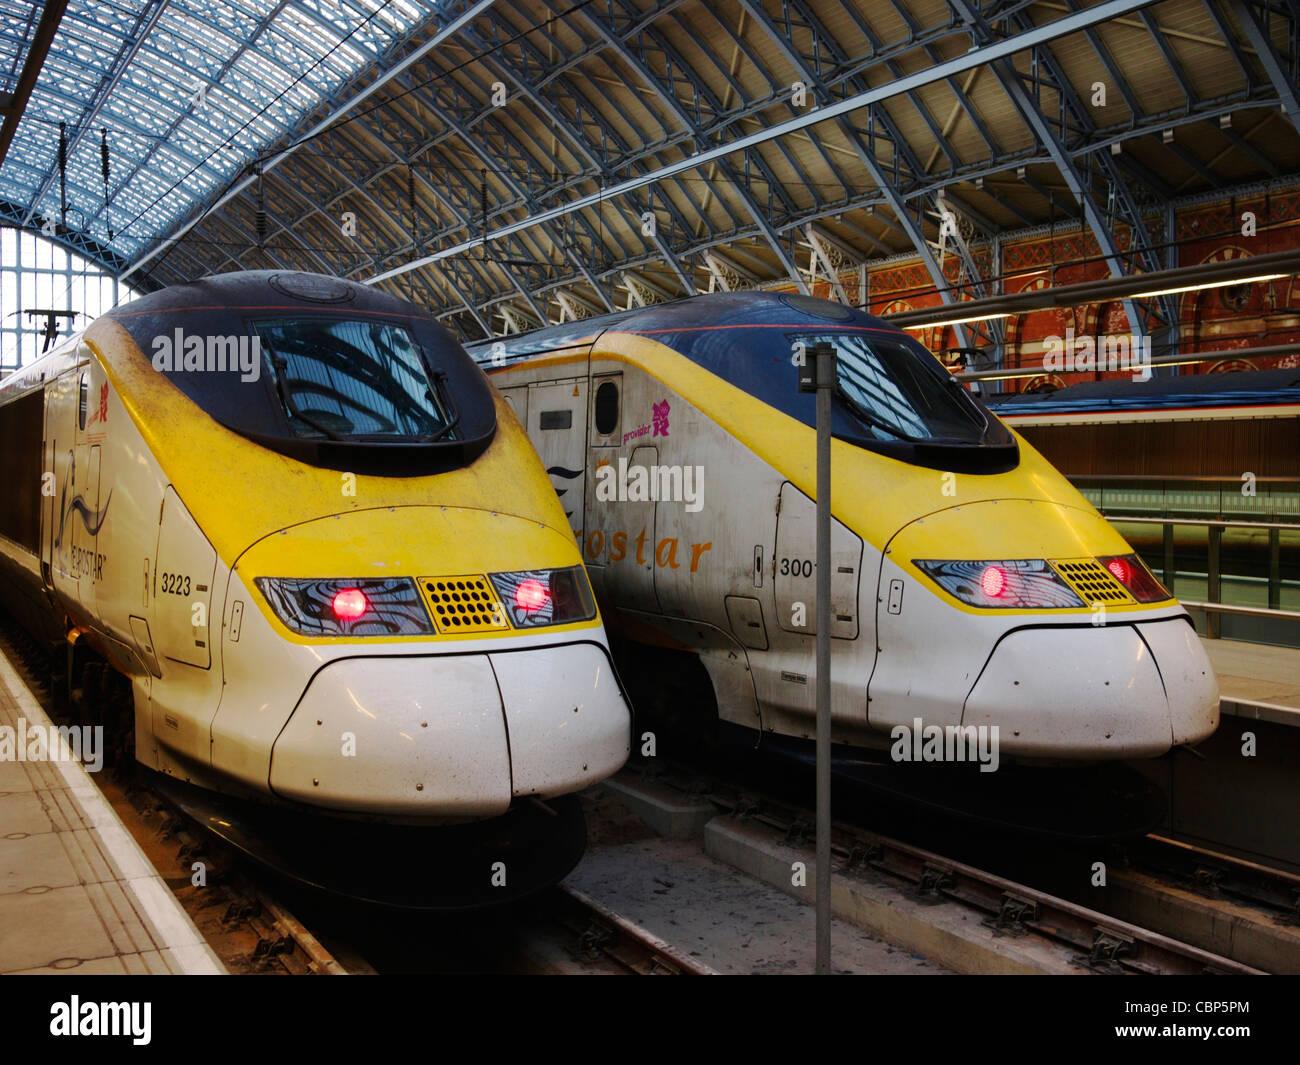 Eurostar trains in St. Pancras Station, London - Stock Image